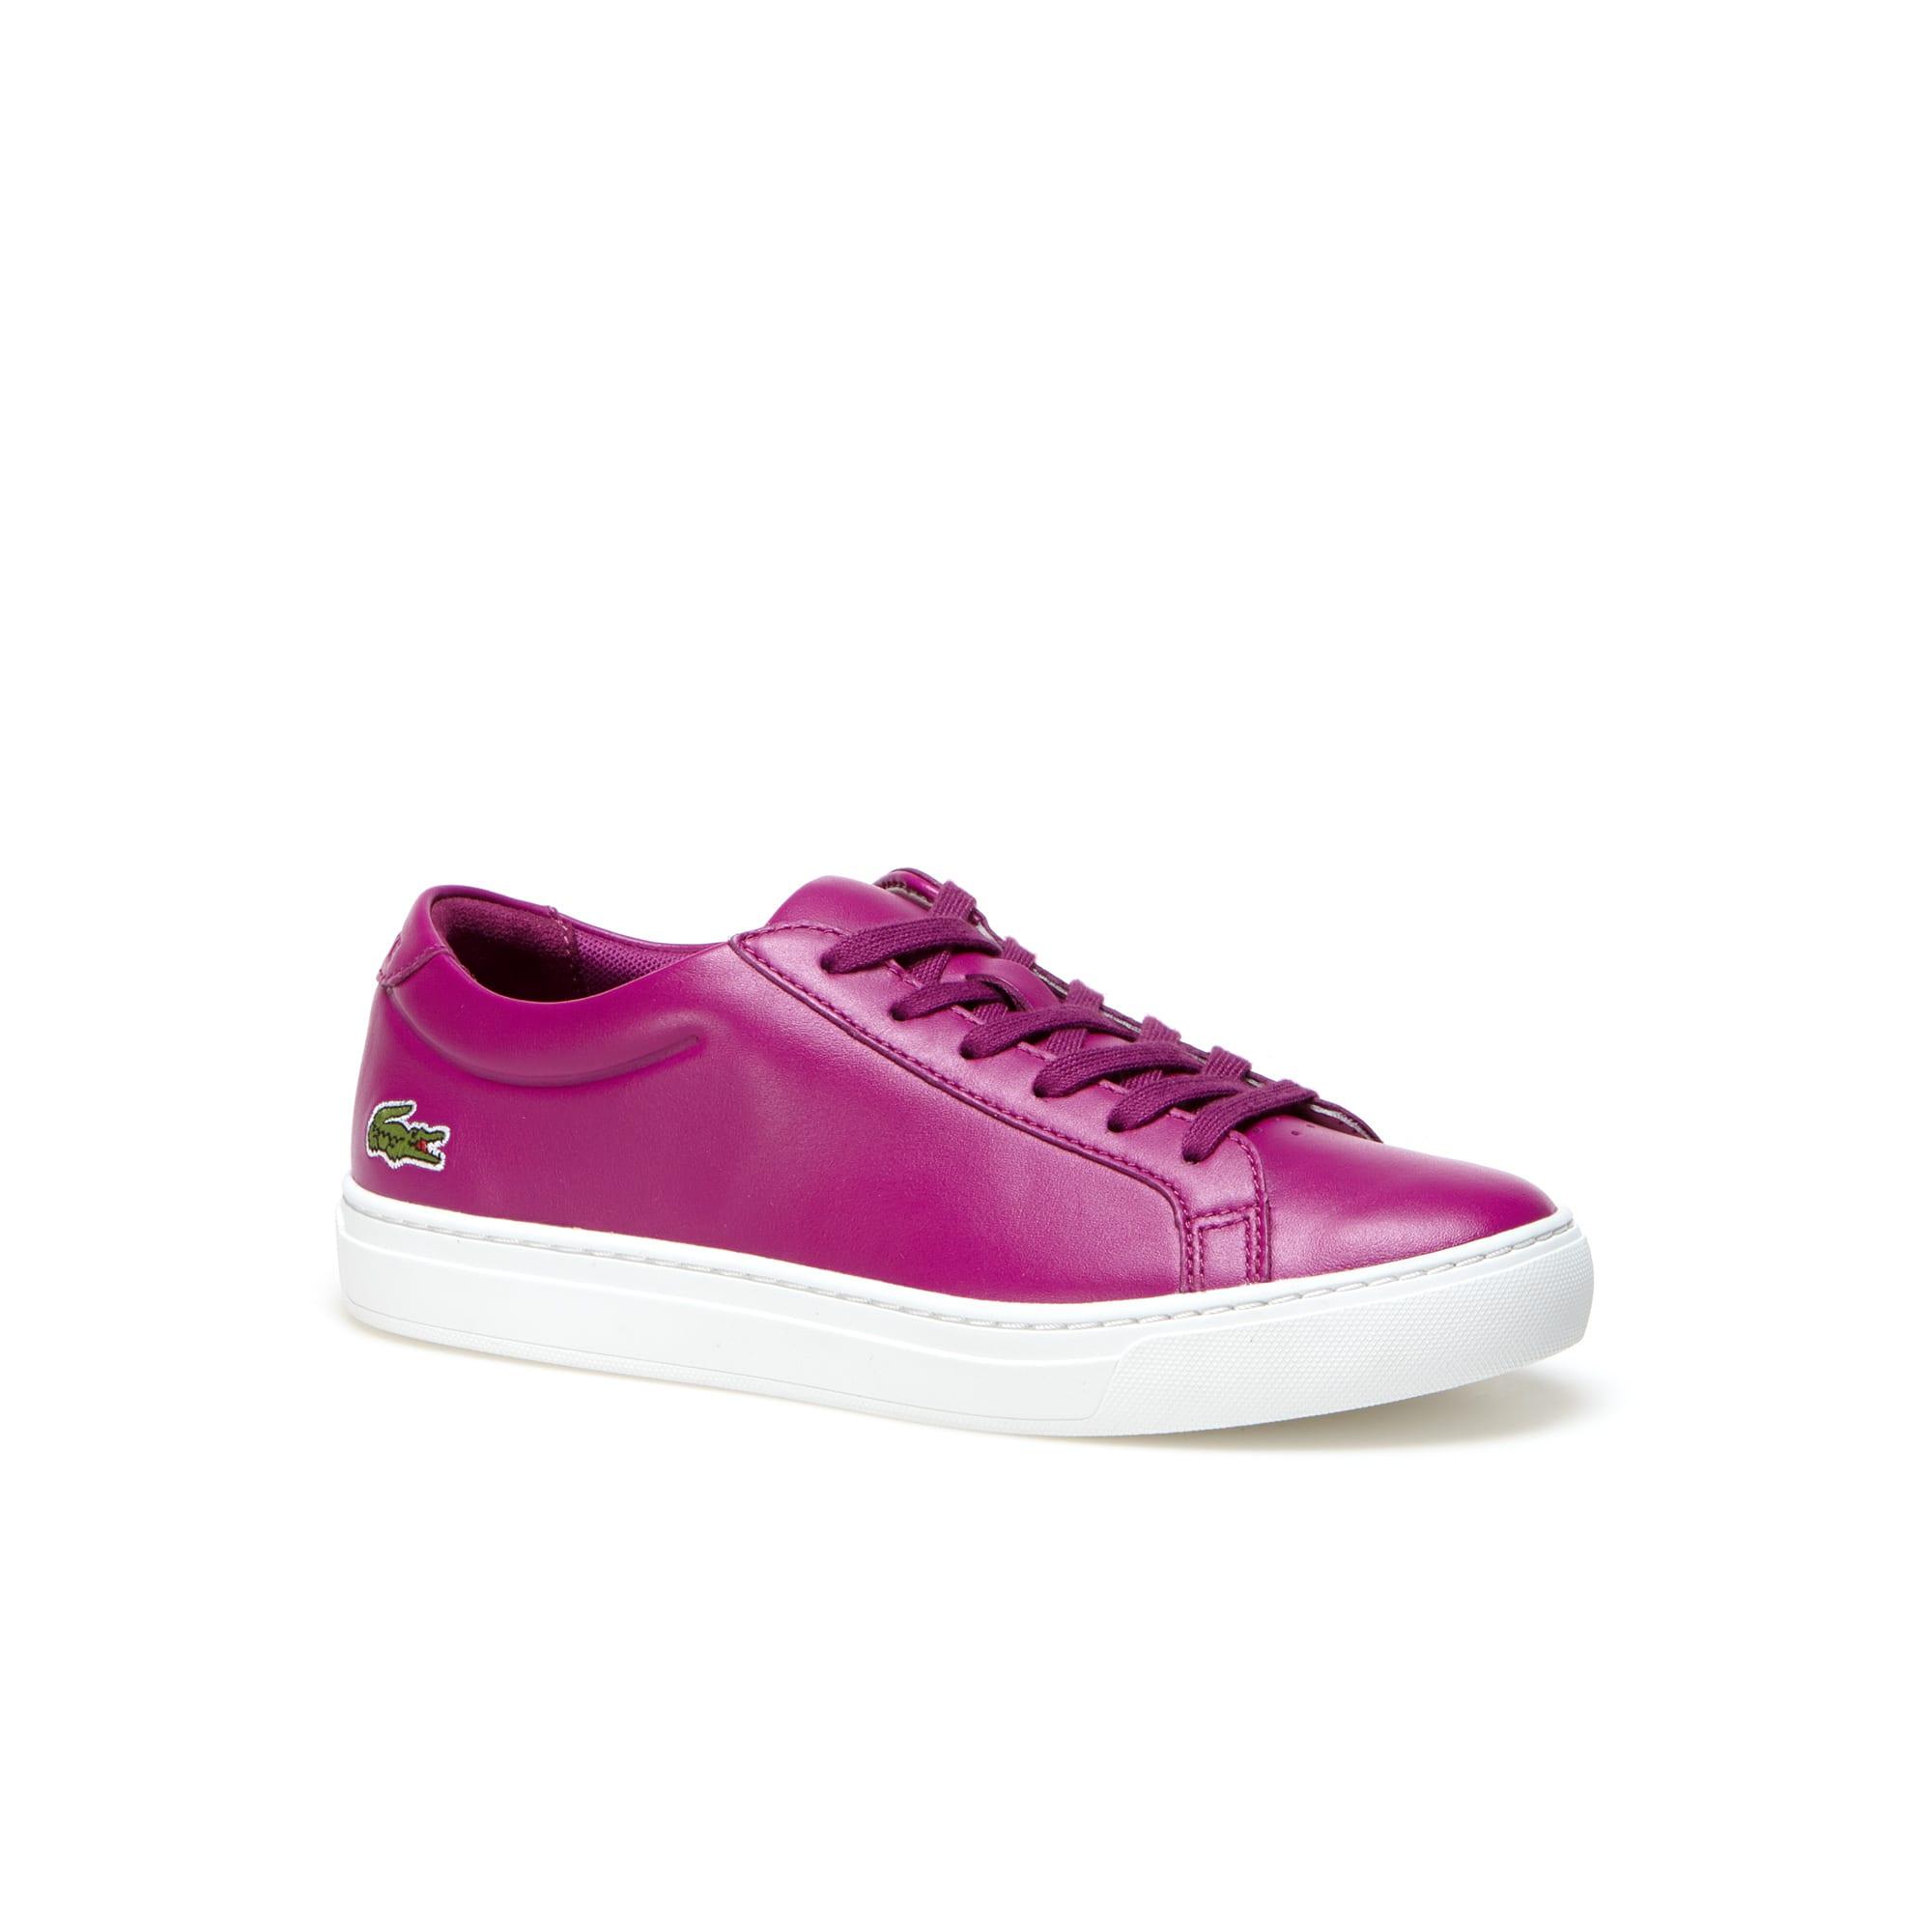 Sneakers L.12.12 en cuir brillant monochrome